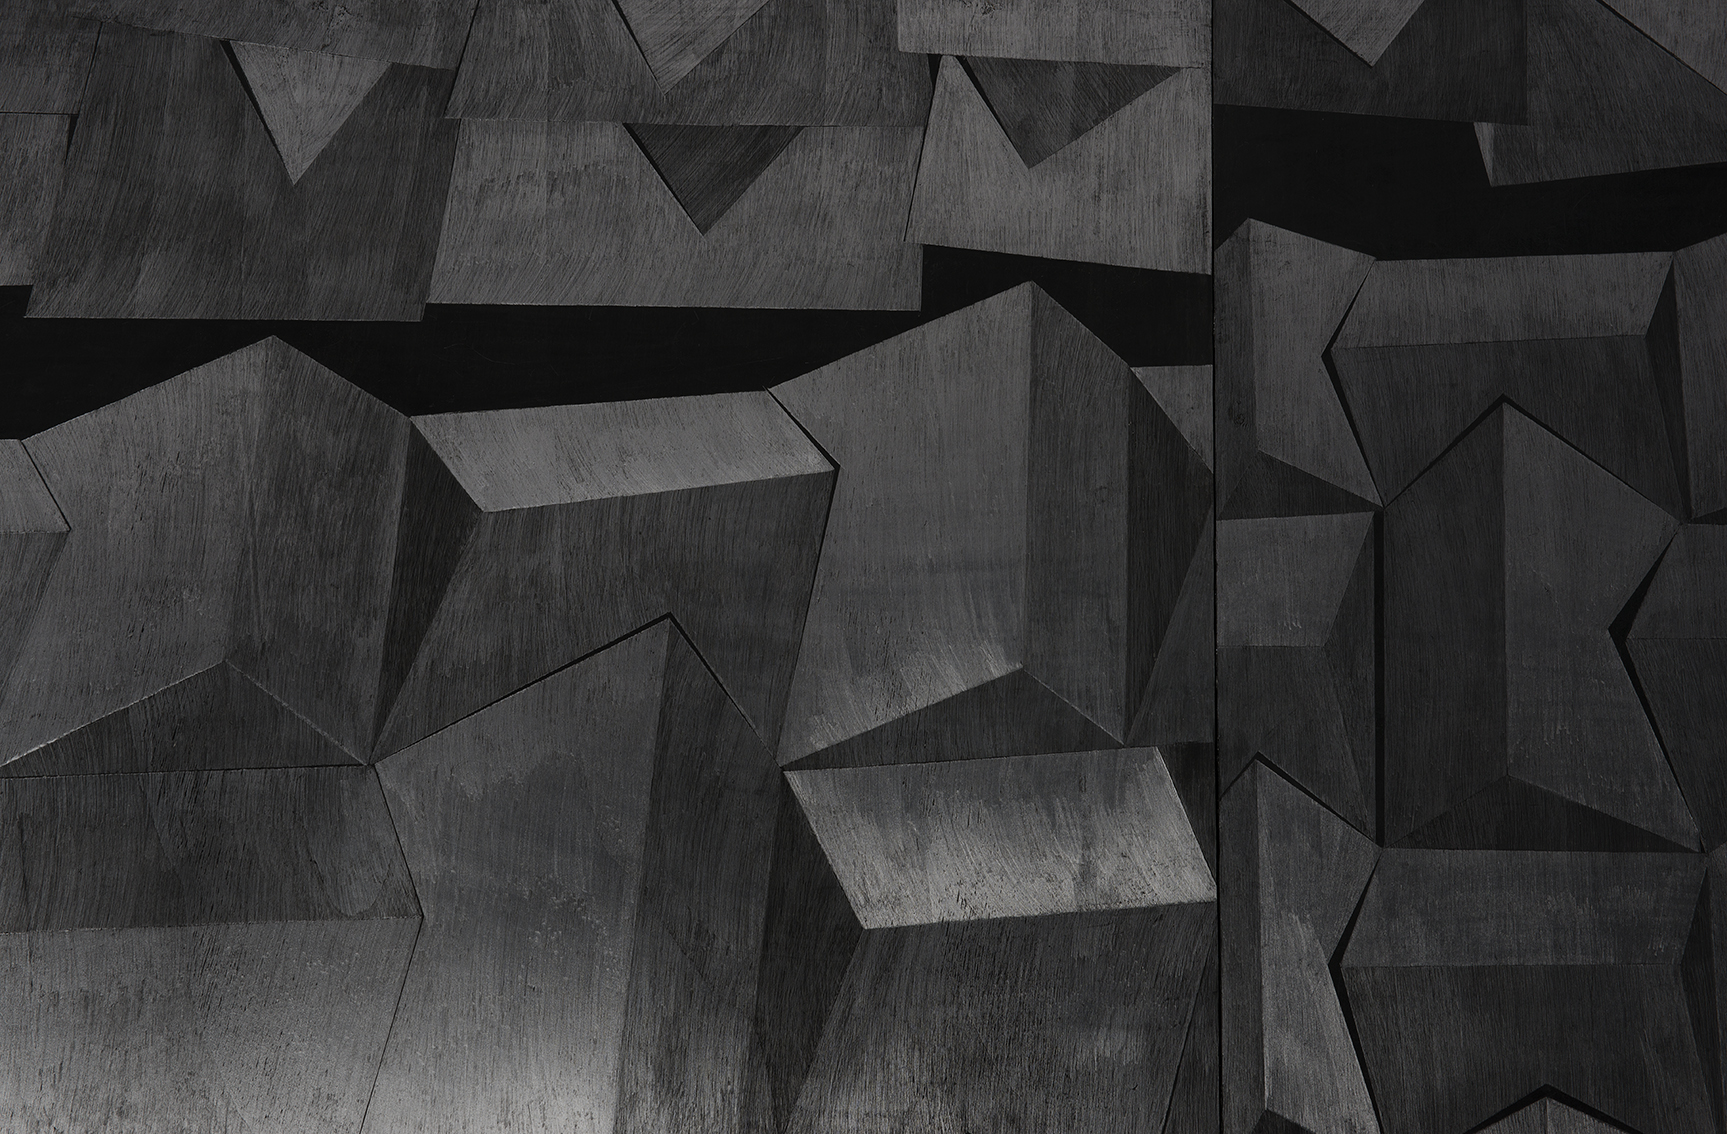 Hado, פחם וגרפיט על עץ, פרט מתוך מיצב, 2014 (4).jpg